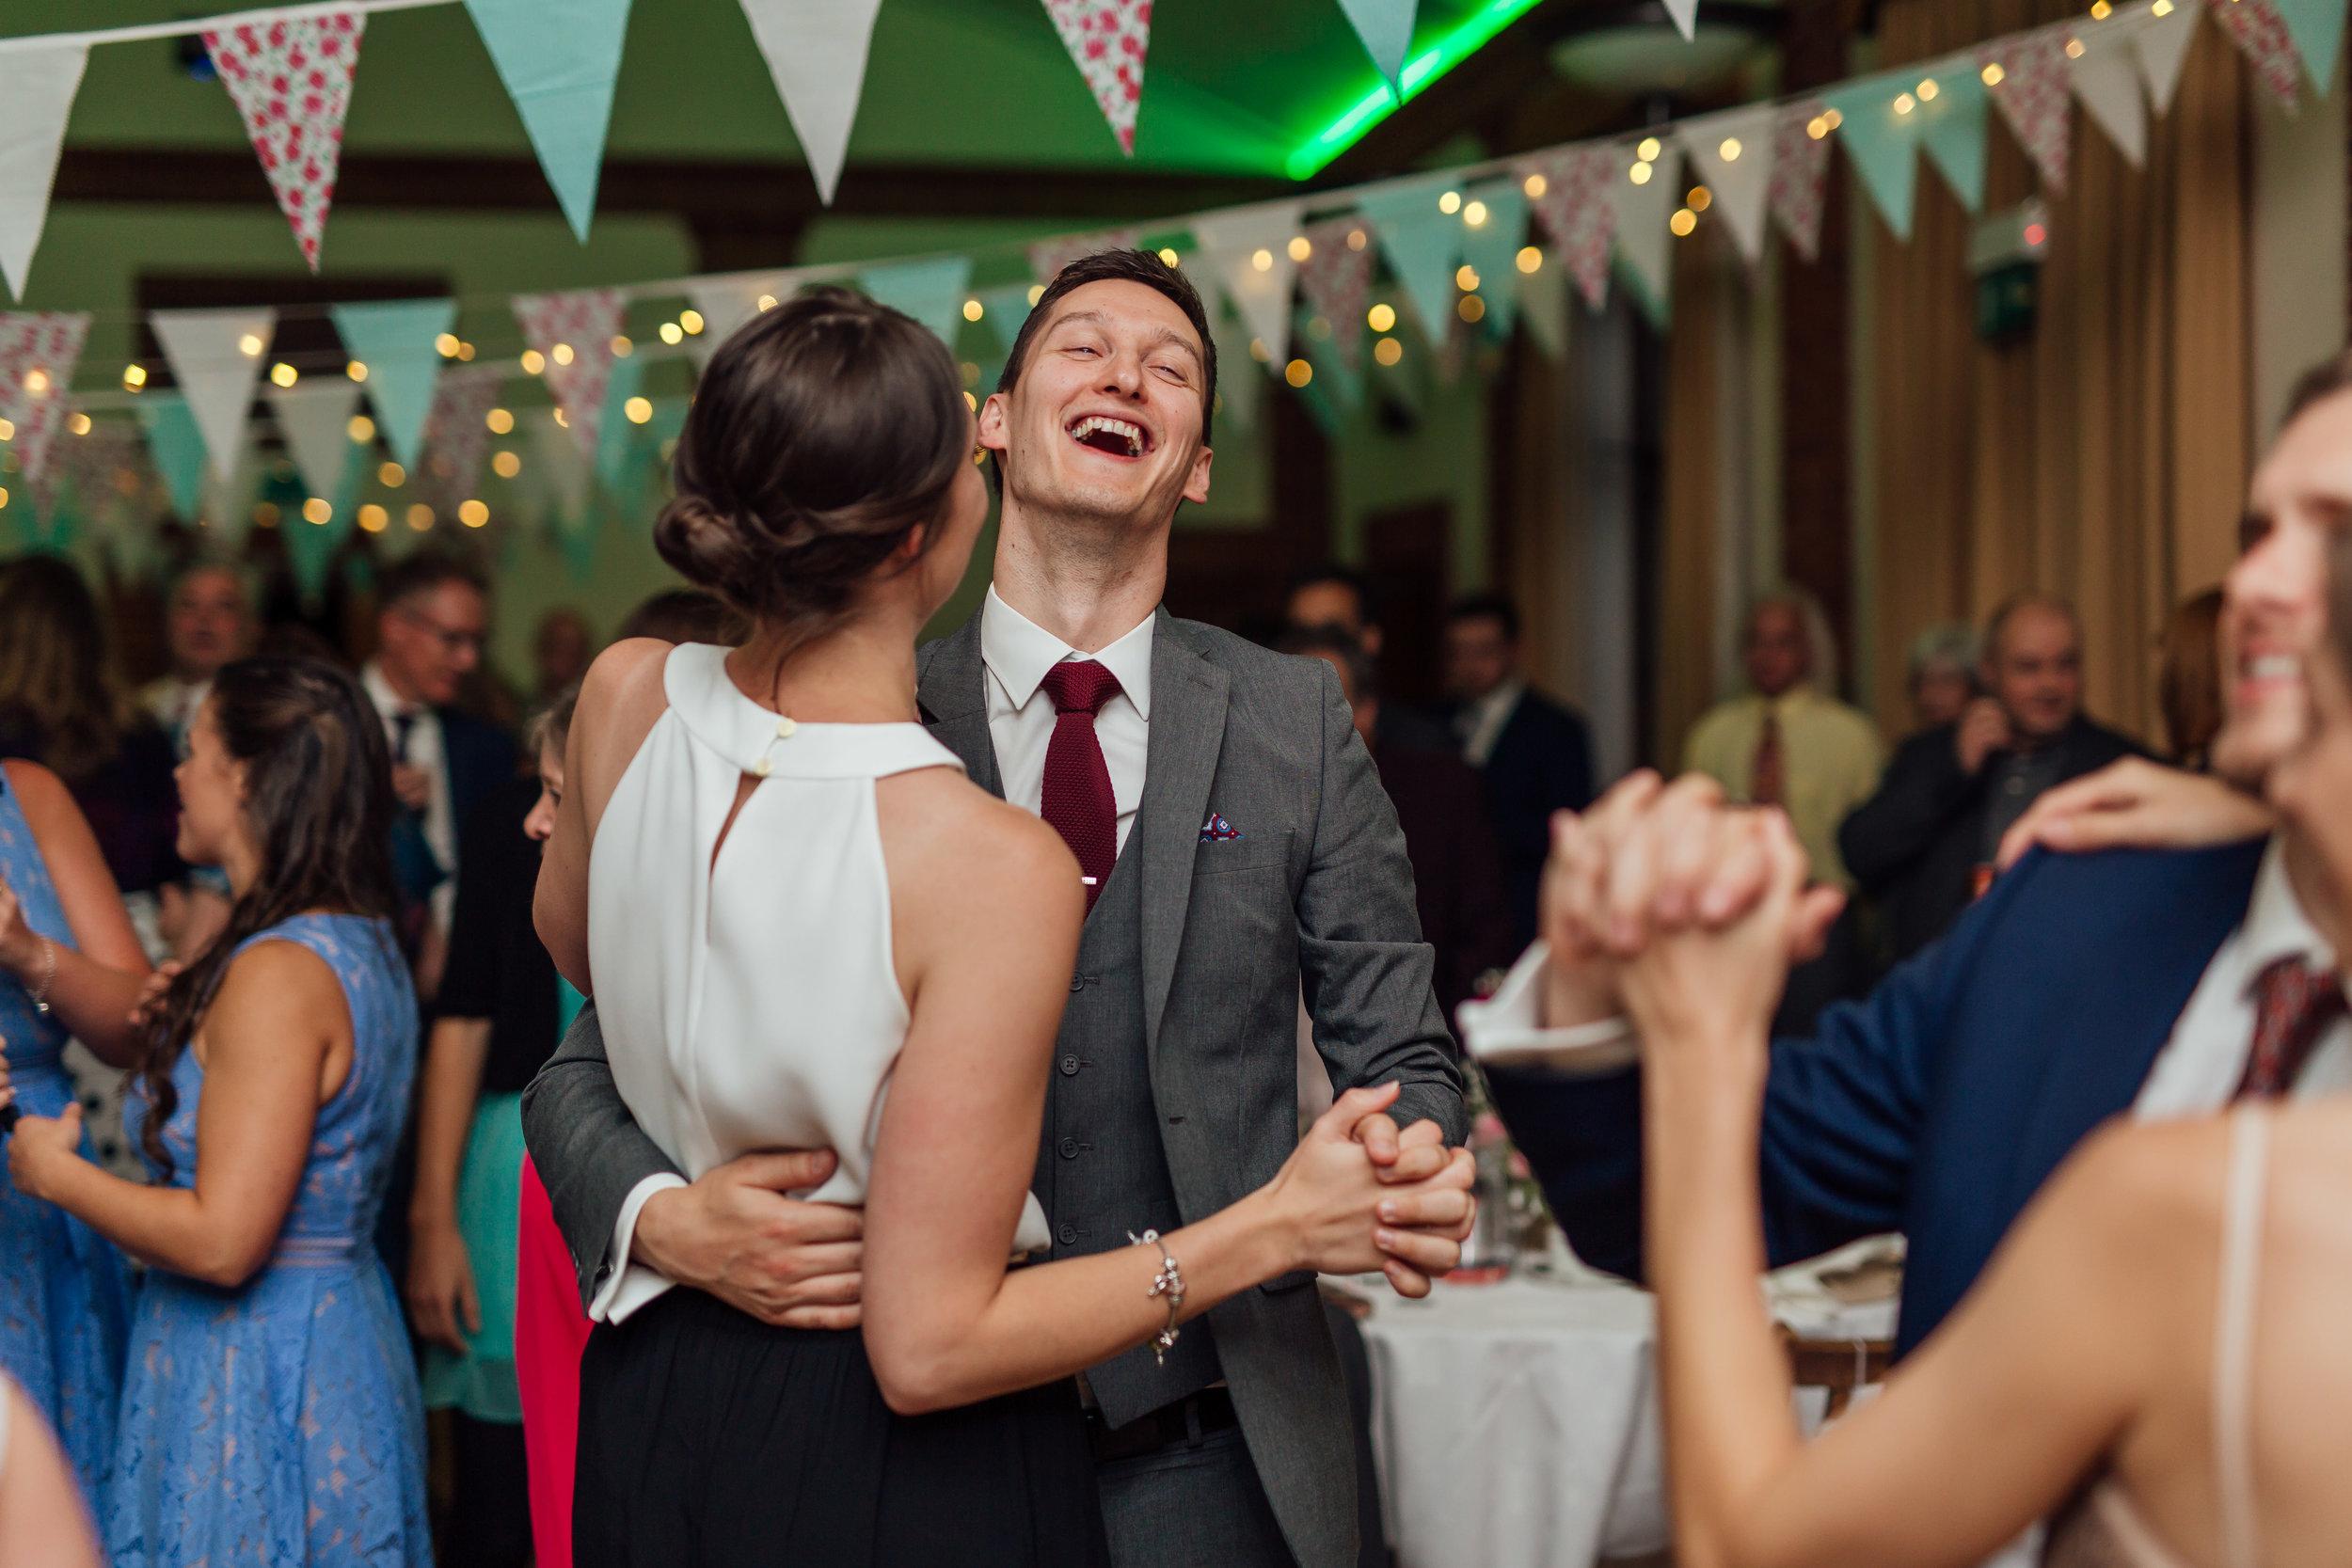 wedding-dancing-rotherwick-village-hall-wedding-hampshire / Amy-james-photography / Hampshire-wedding-photographer-hampshire